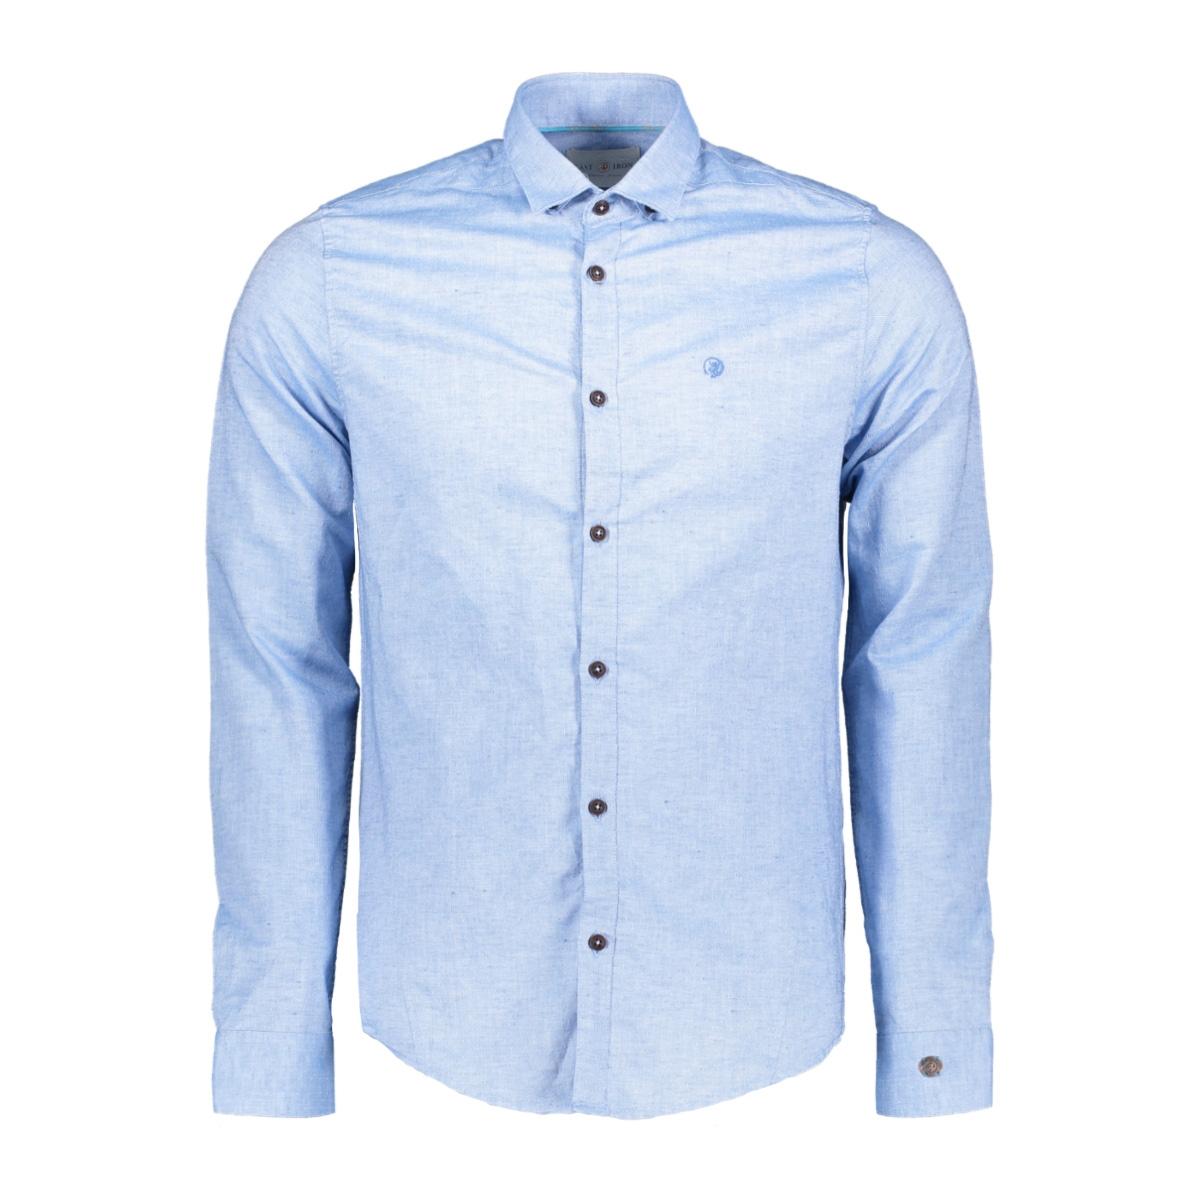 cotton linnen dobby shirt csi193642 cast iron overhemd 5307